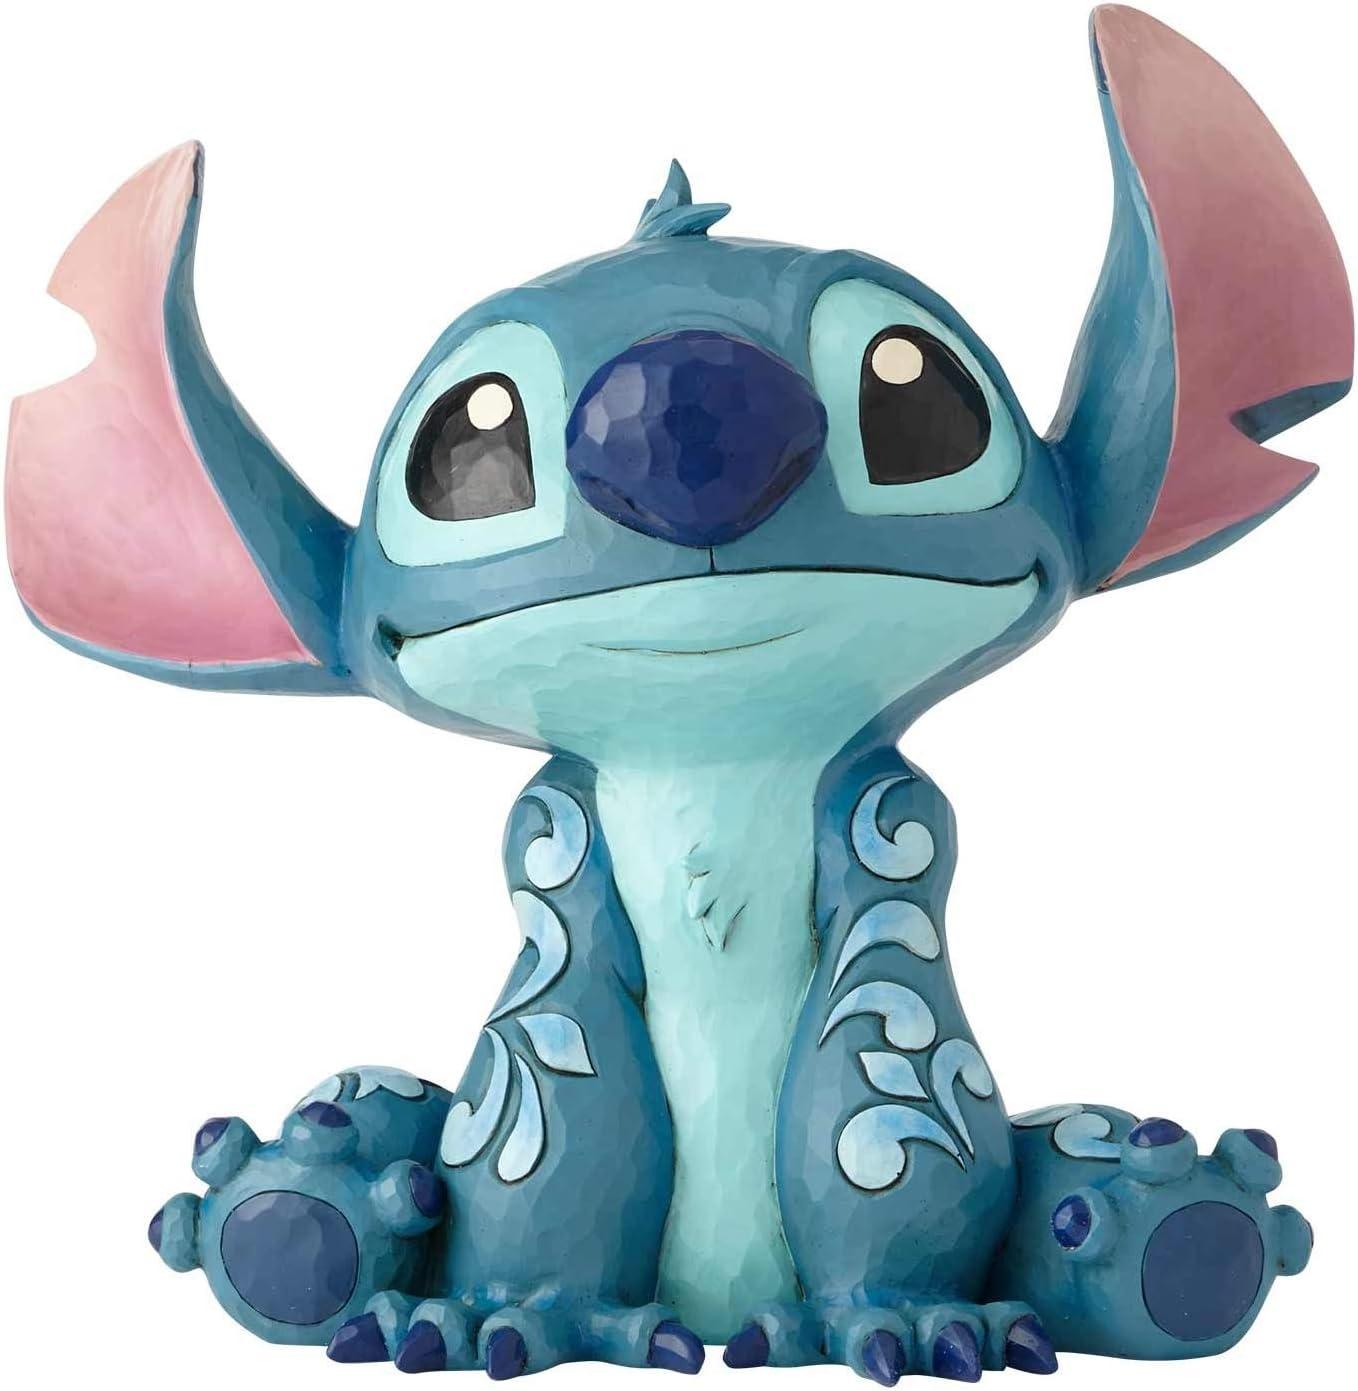 Enesco Disney Traditions by Jim Shore Lilo and Stich Big Trouble Figurine, 14 Inch, Blue